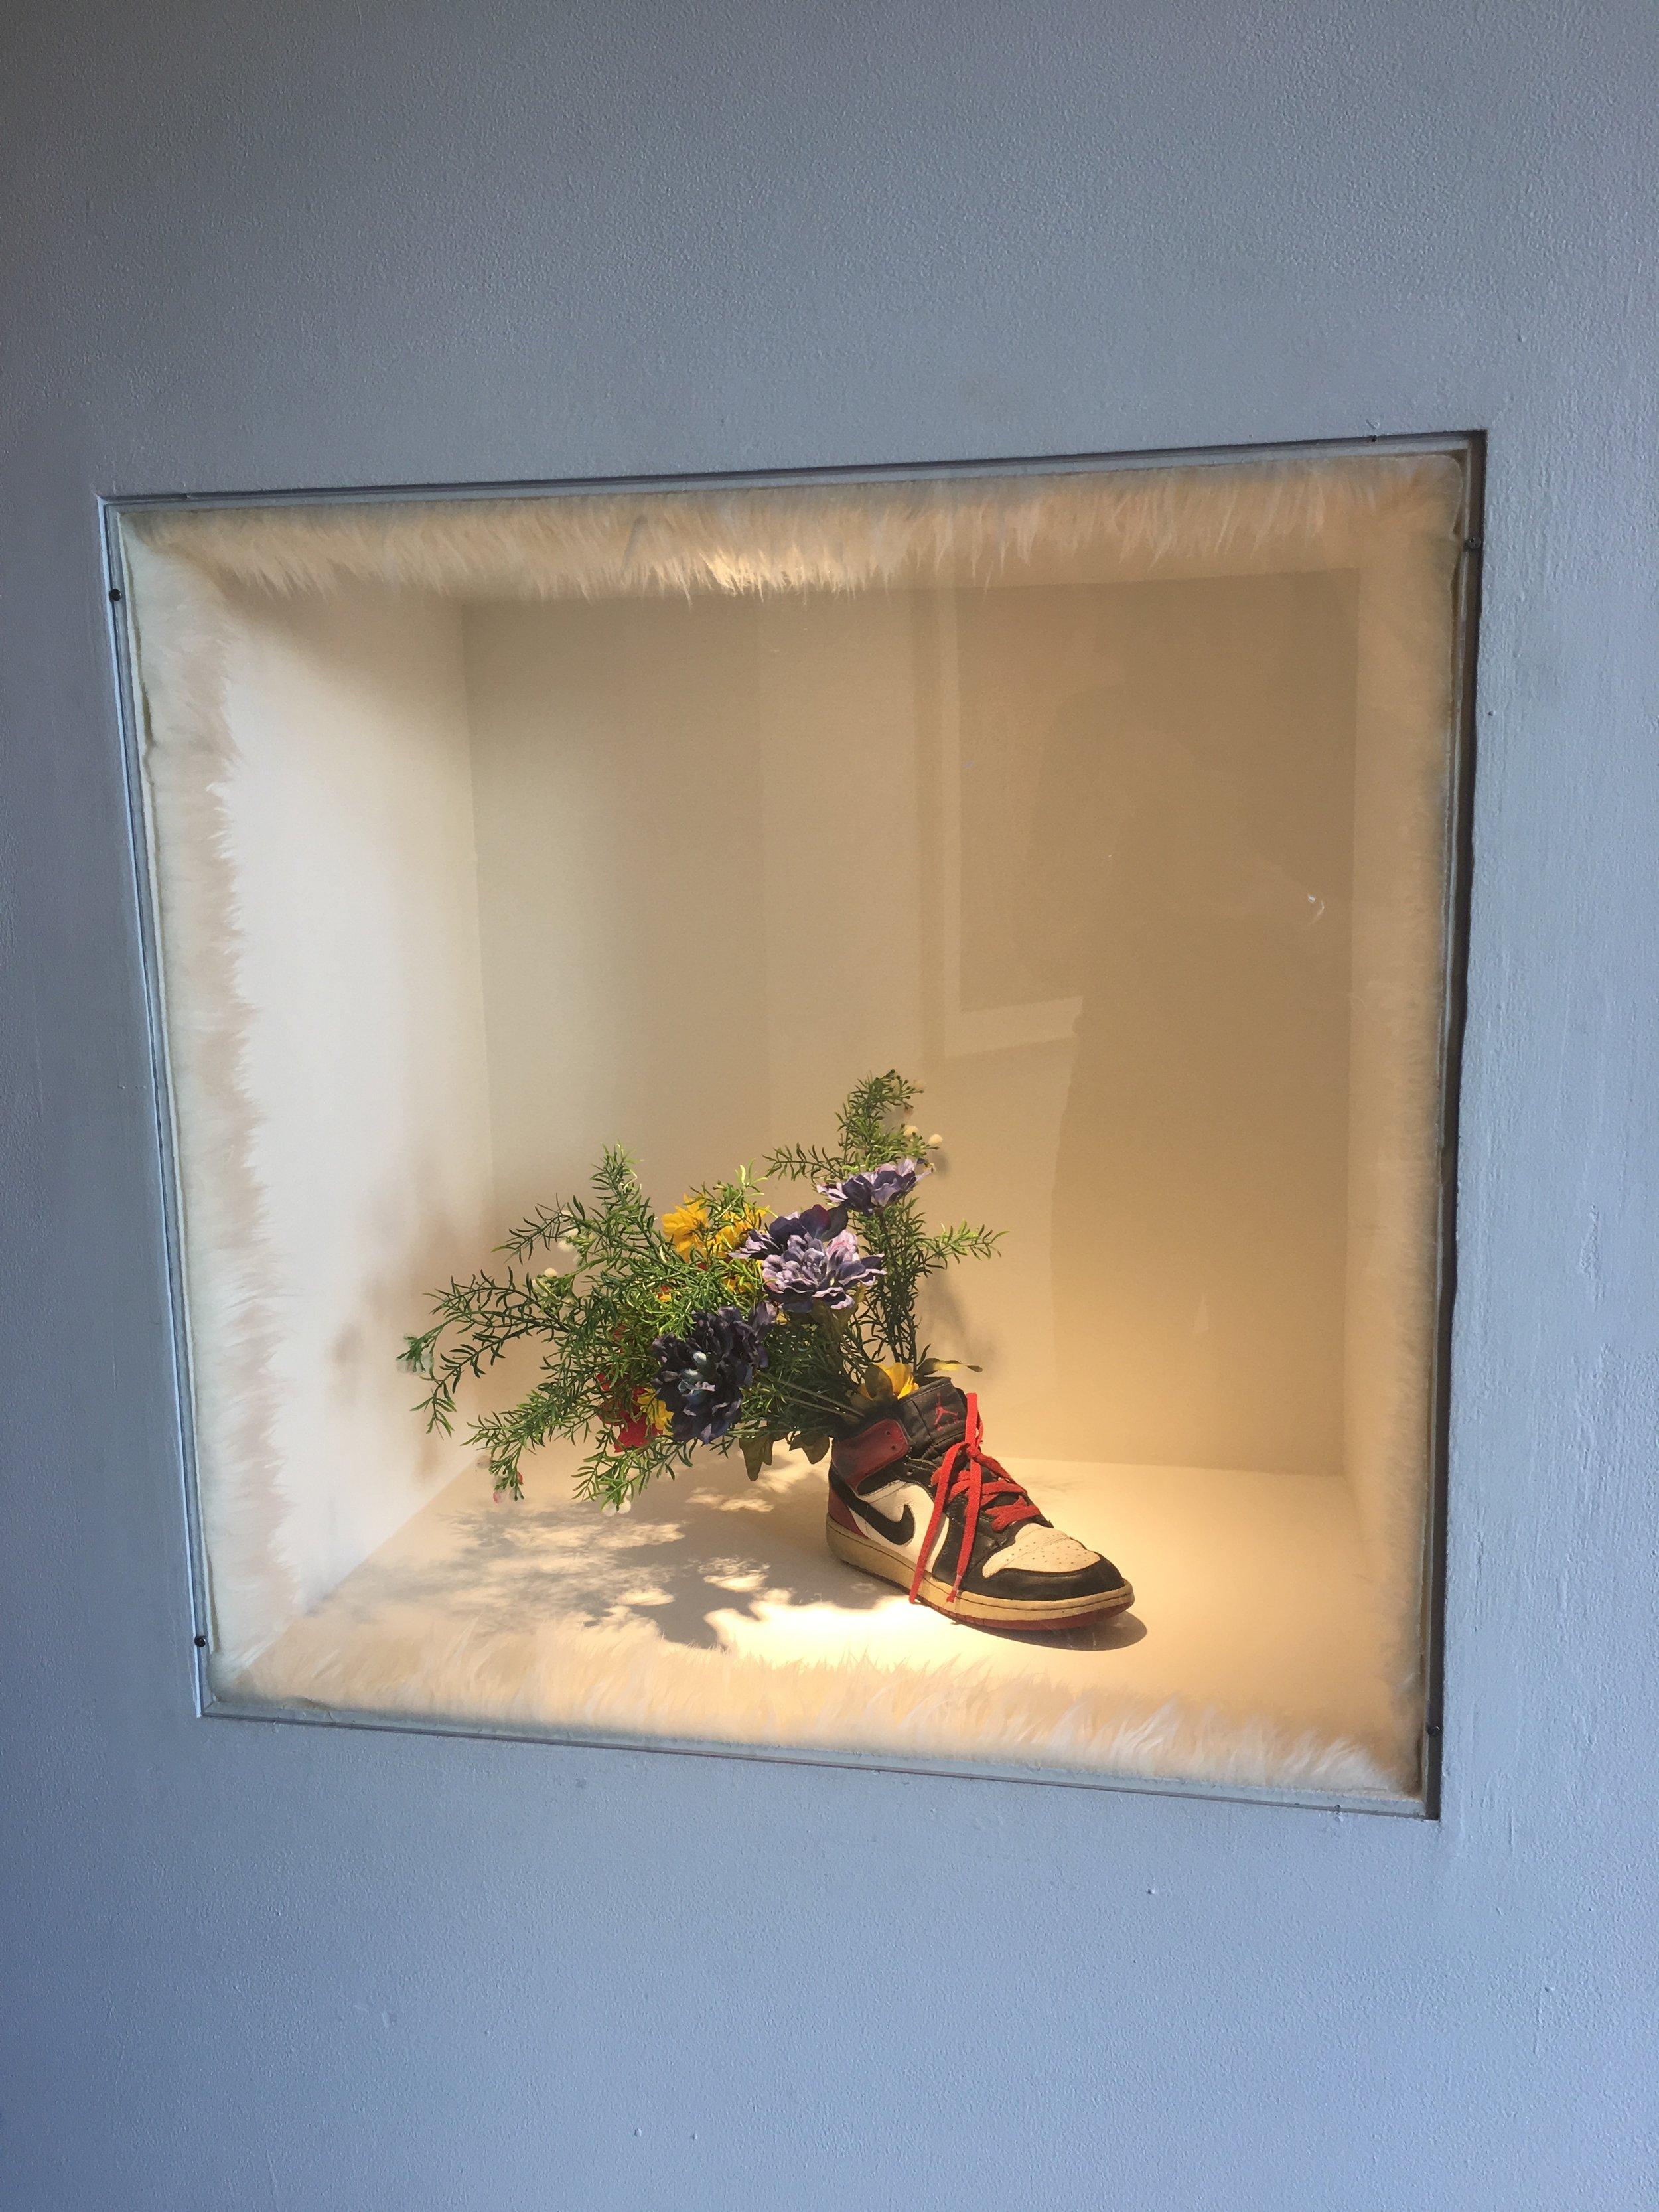 Daydreaming  (installation detail) by  Uzumaki Cepeda at the LA Craft & Folk Art Museum .